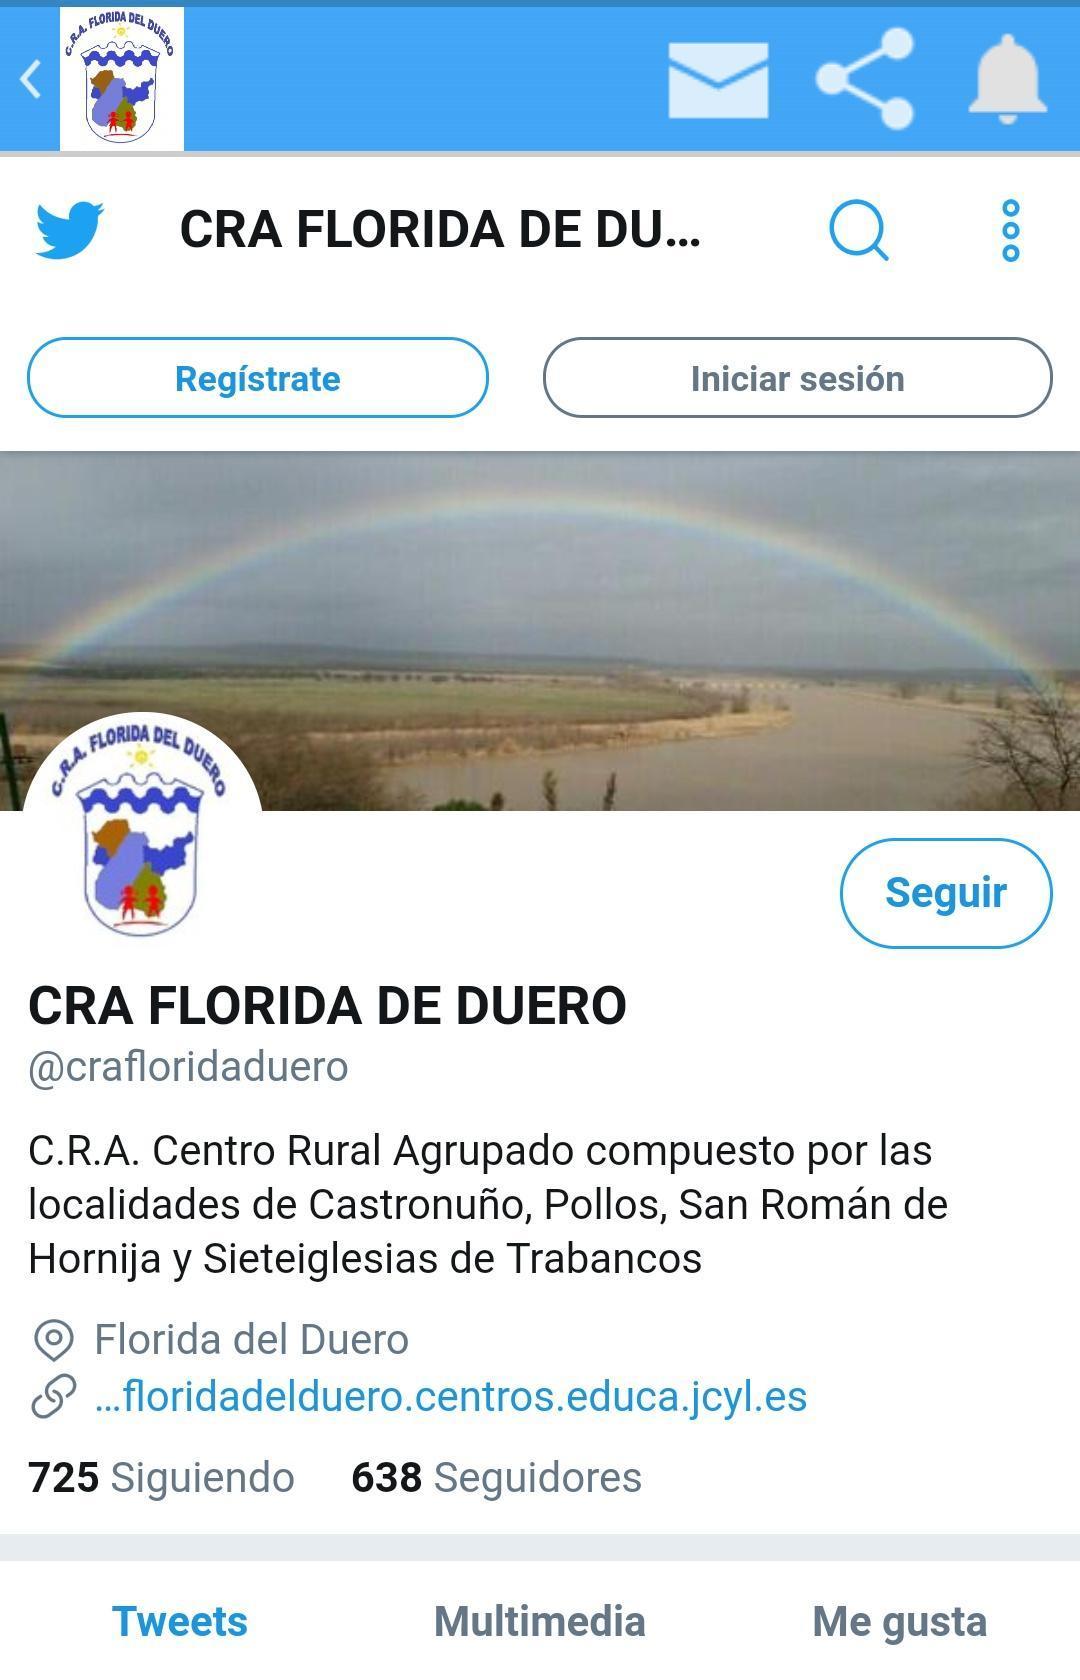 CRA FLORIDA DEL DUERO for Android - APK Download